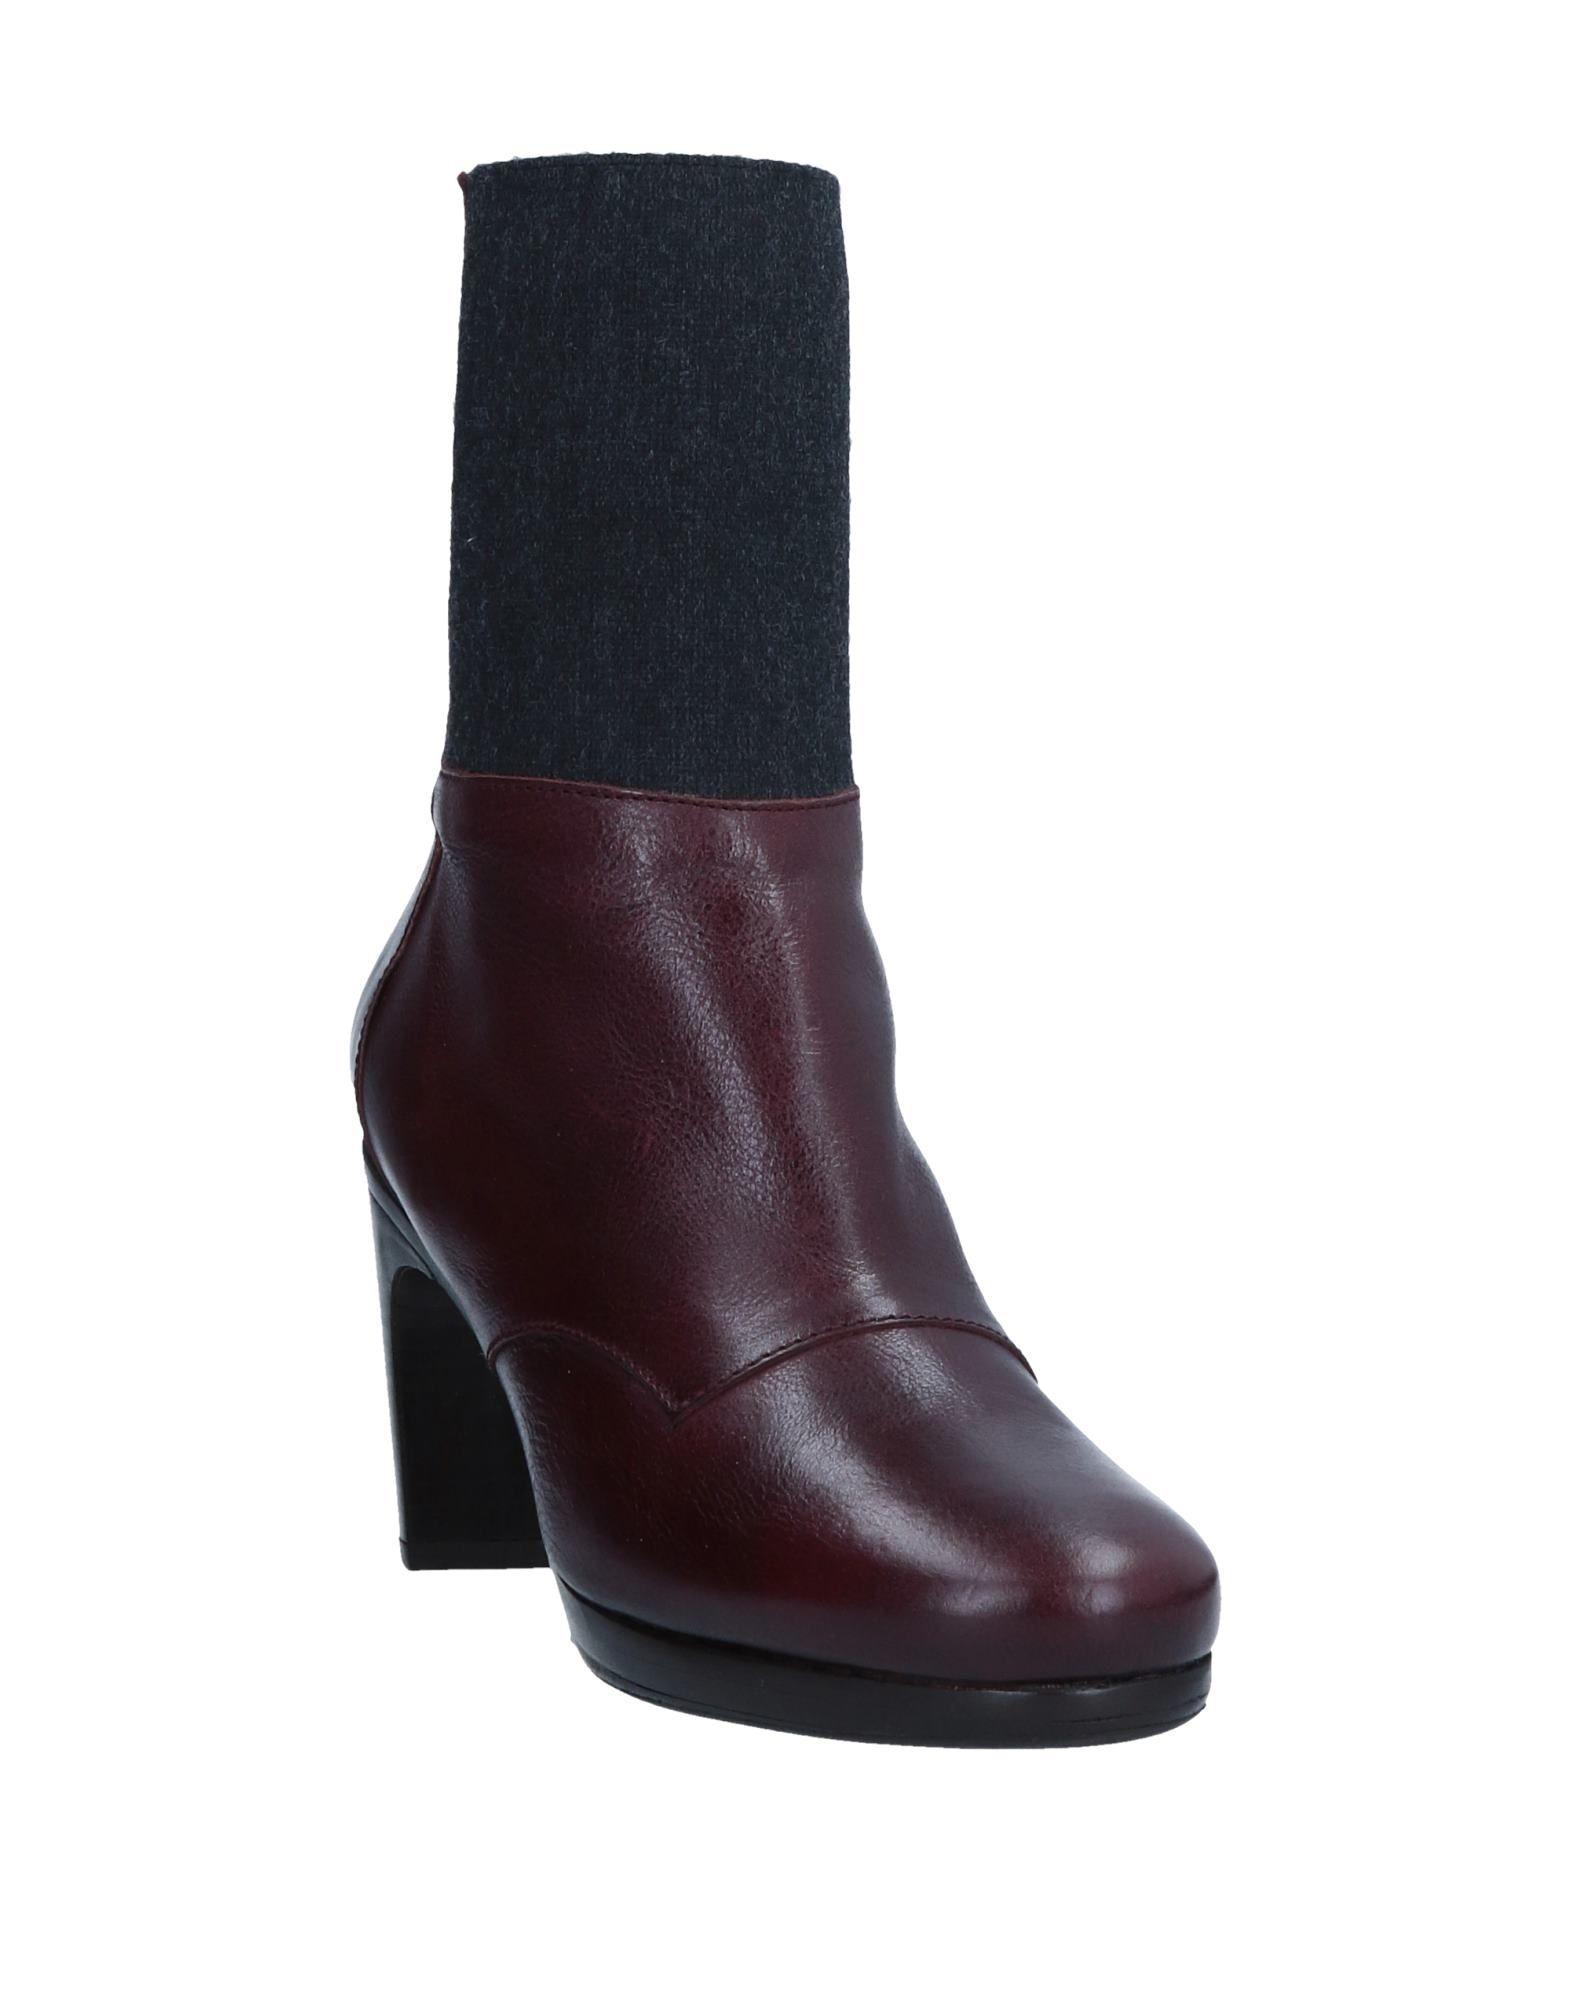 Stilvolle billige Schuhe Anaid Kupuri 11552549DW Stiefelette Damen  11552549DW Kupuri 05553e